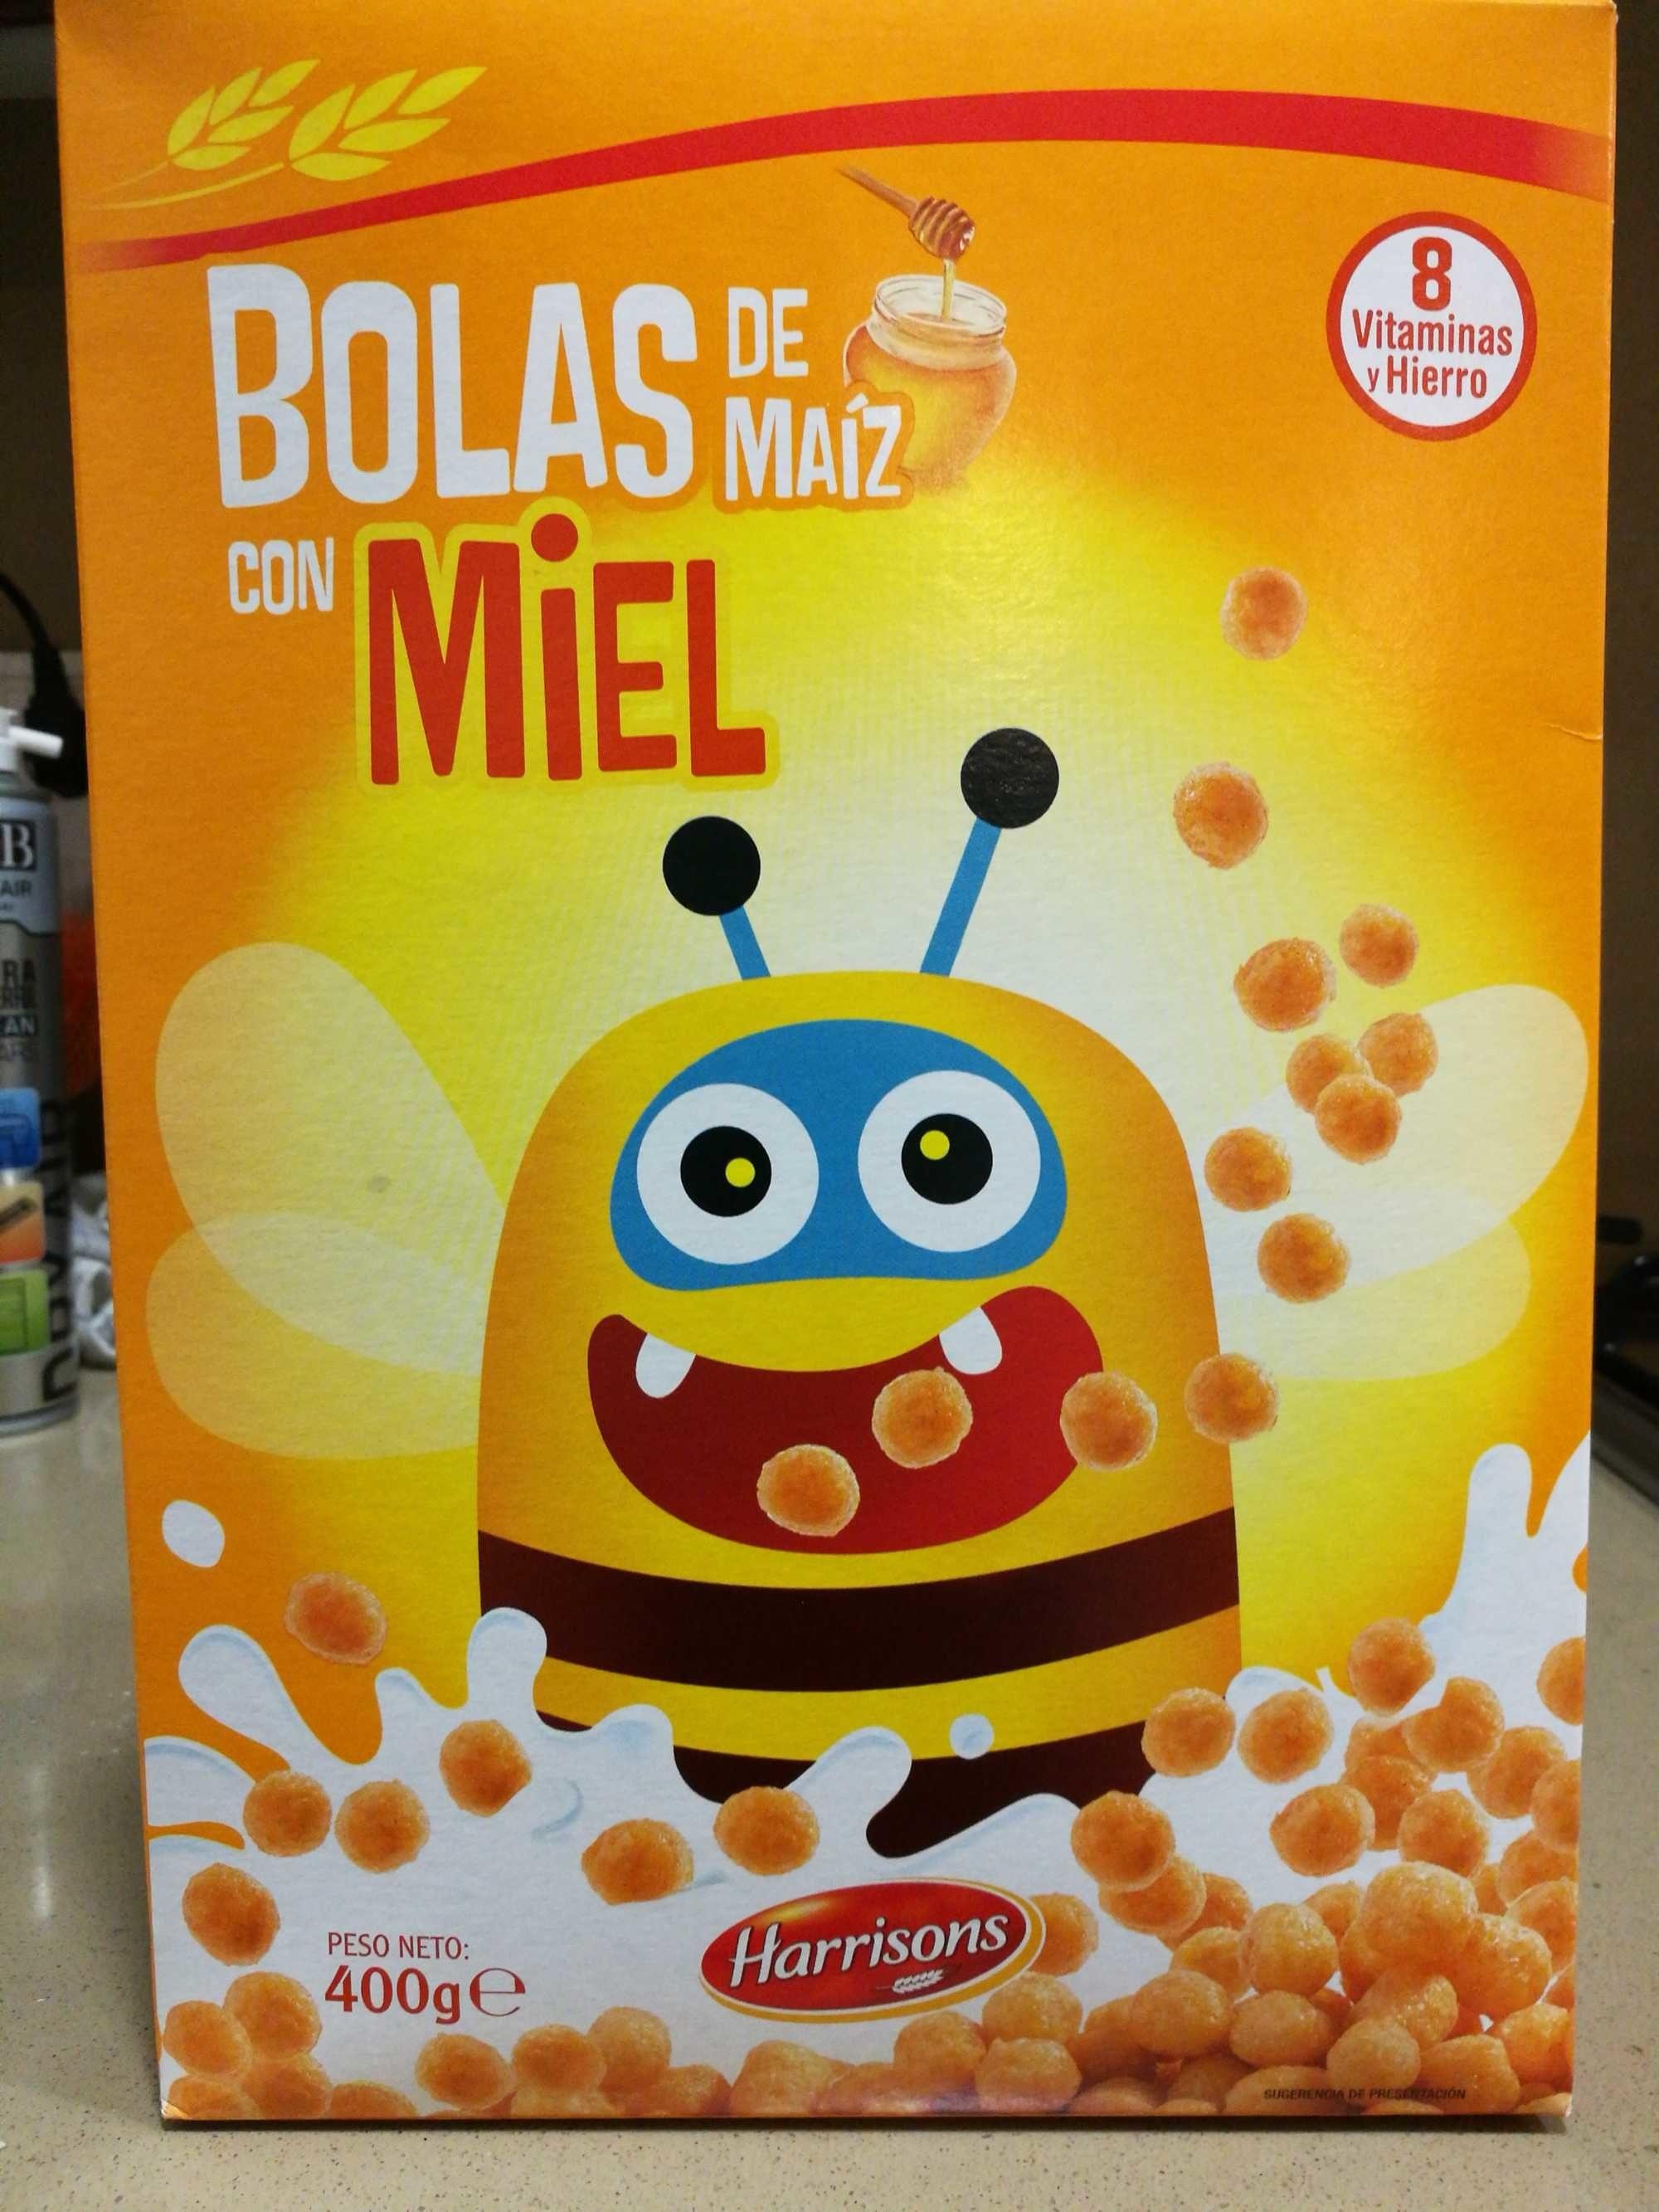 Bolas de maíz con miel - Product